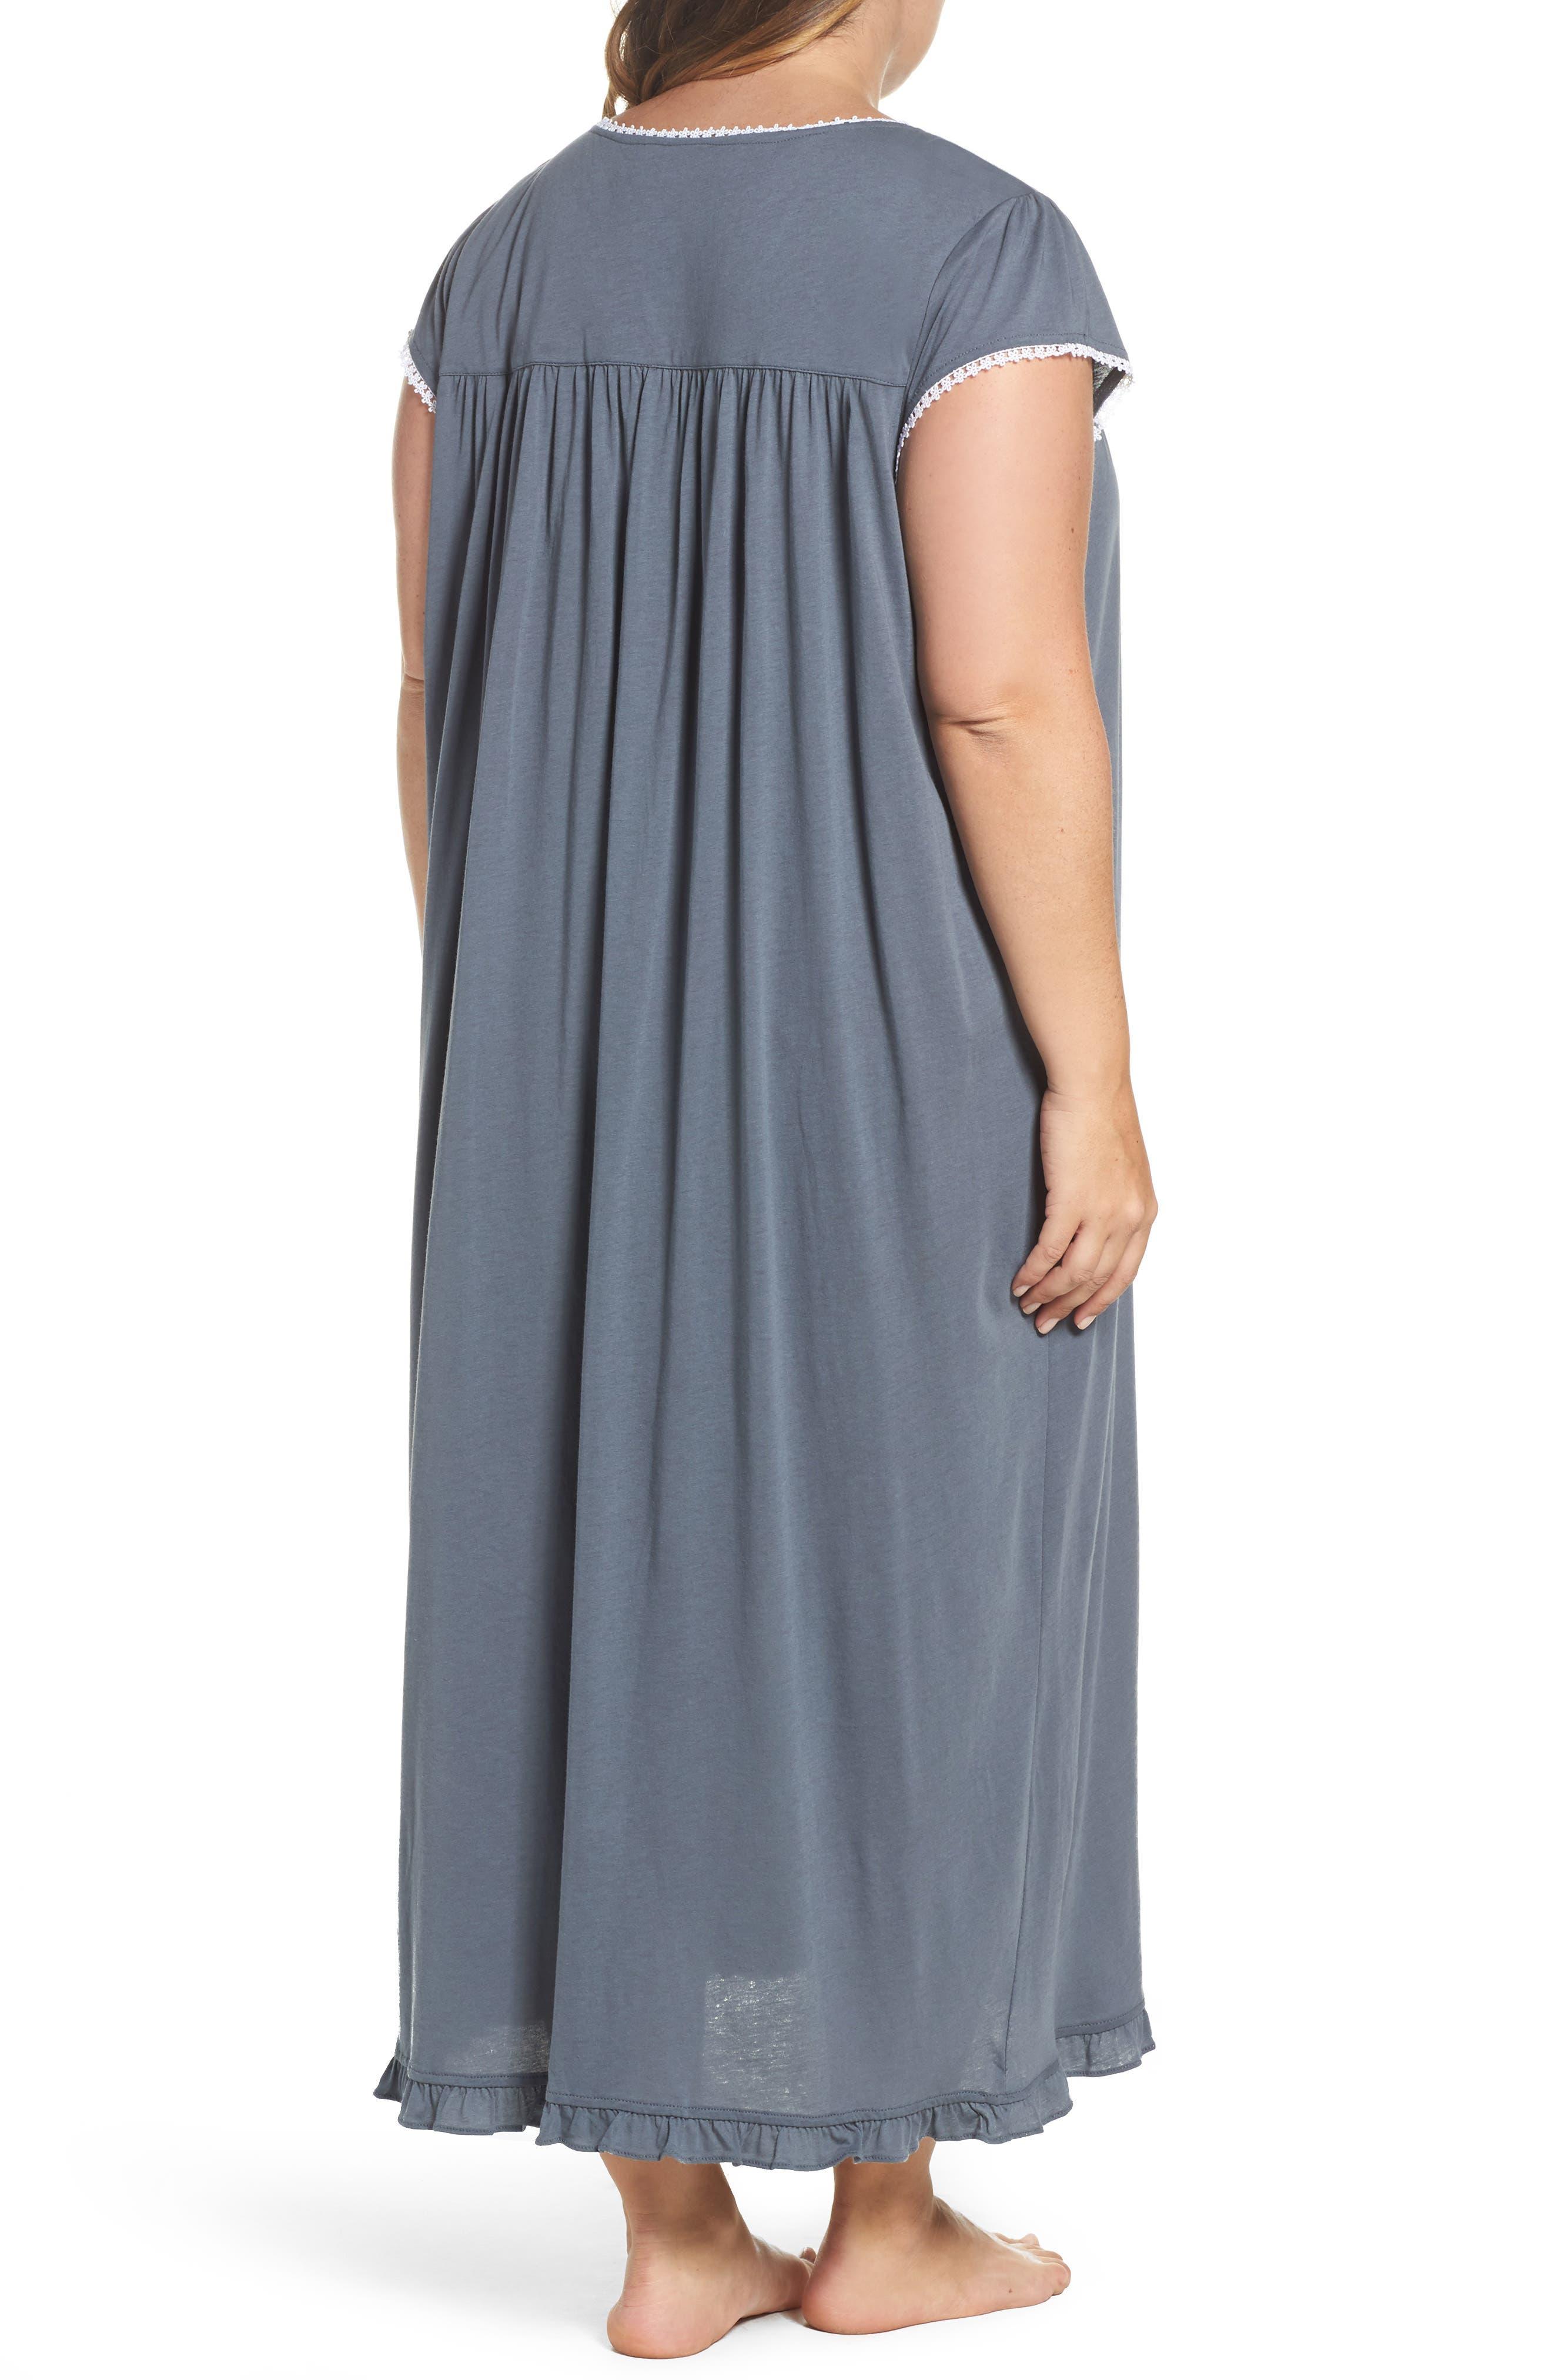 Cotton & Modal Long Nightgown,                             Alternate thumbnail 2, color,                             Grey